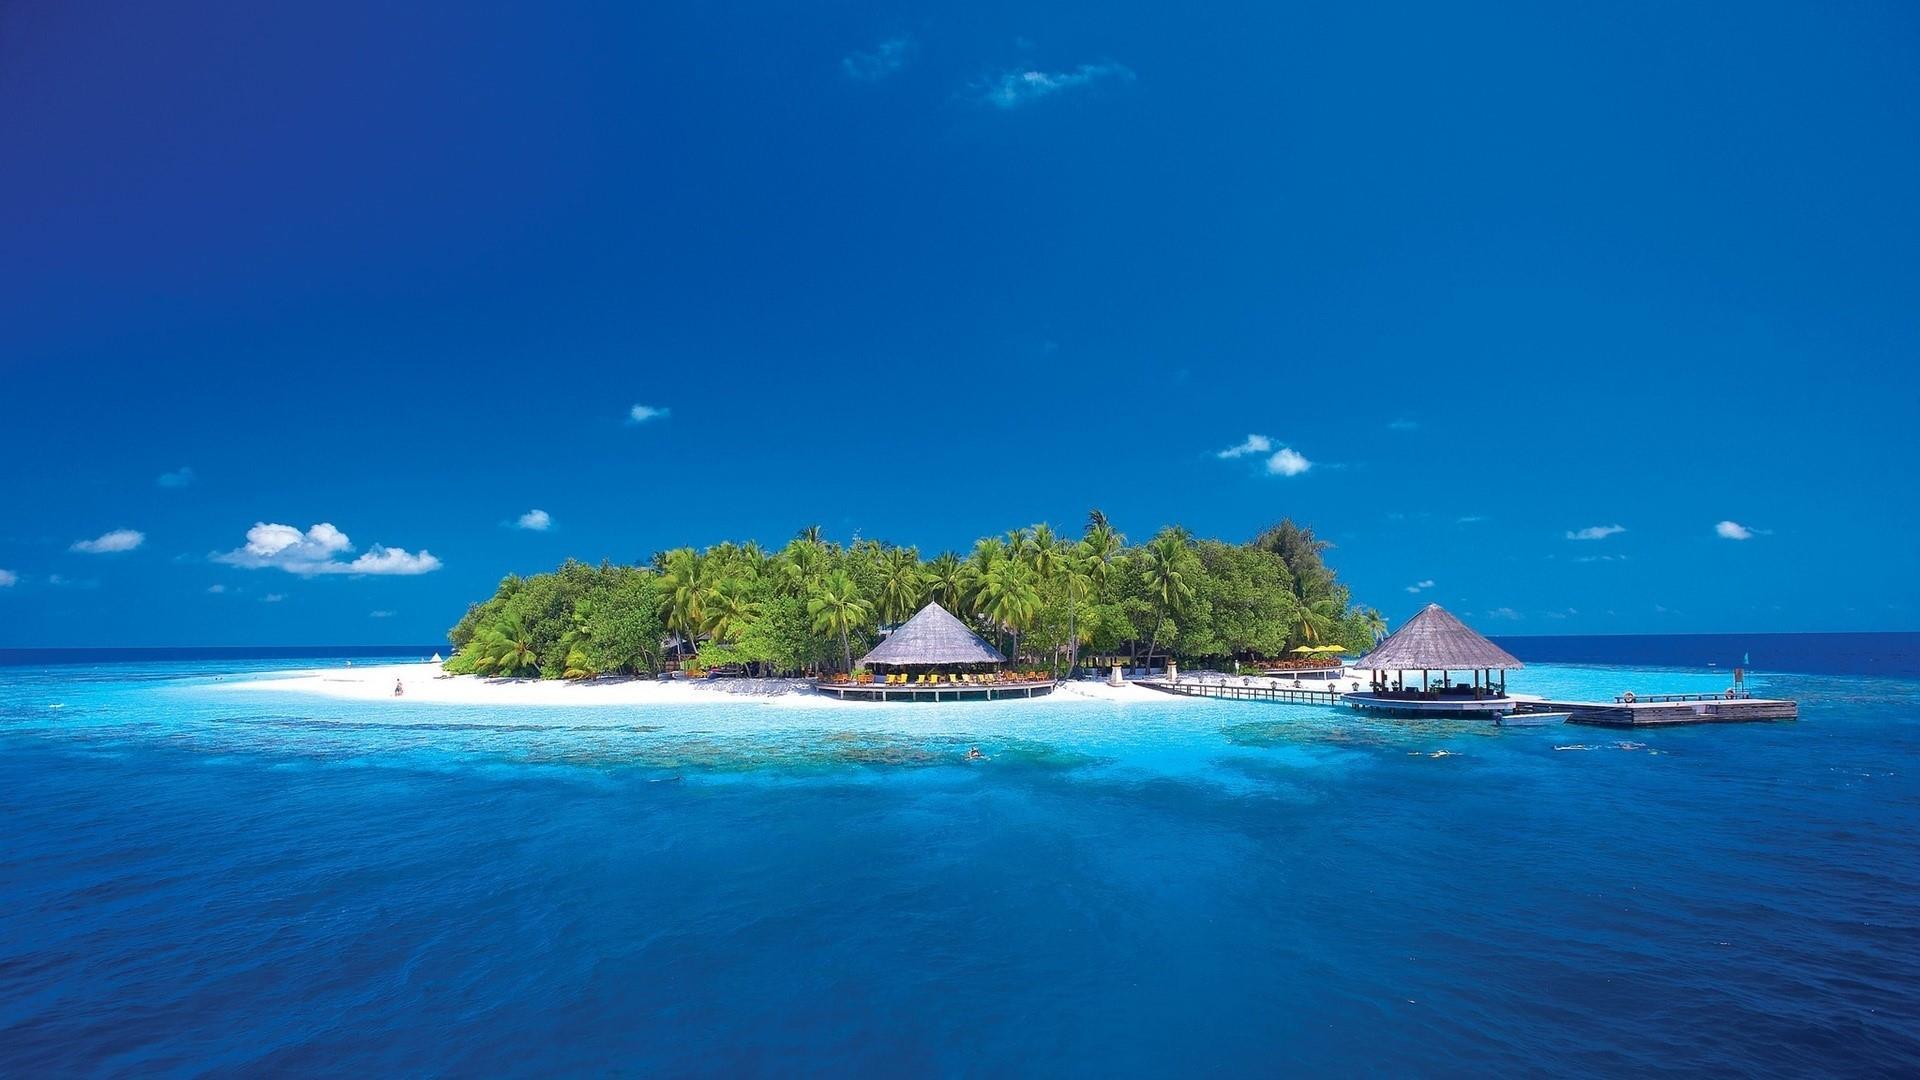 Exotic island wallpaper